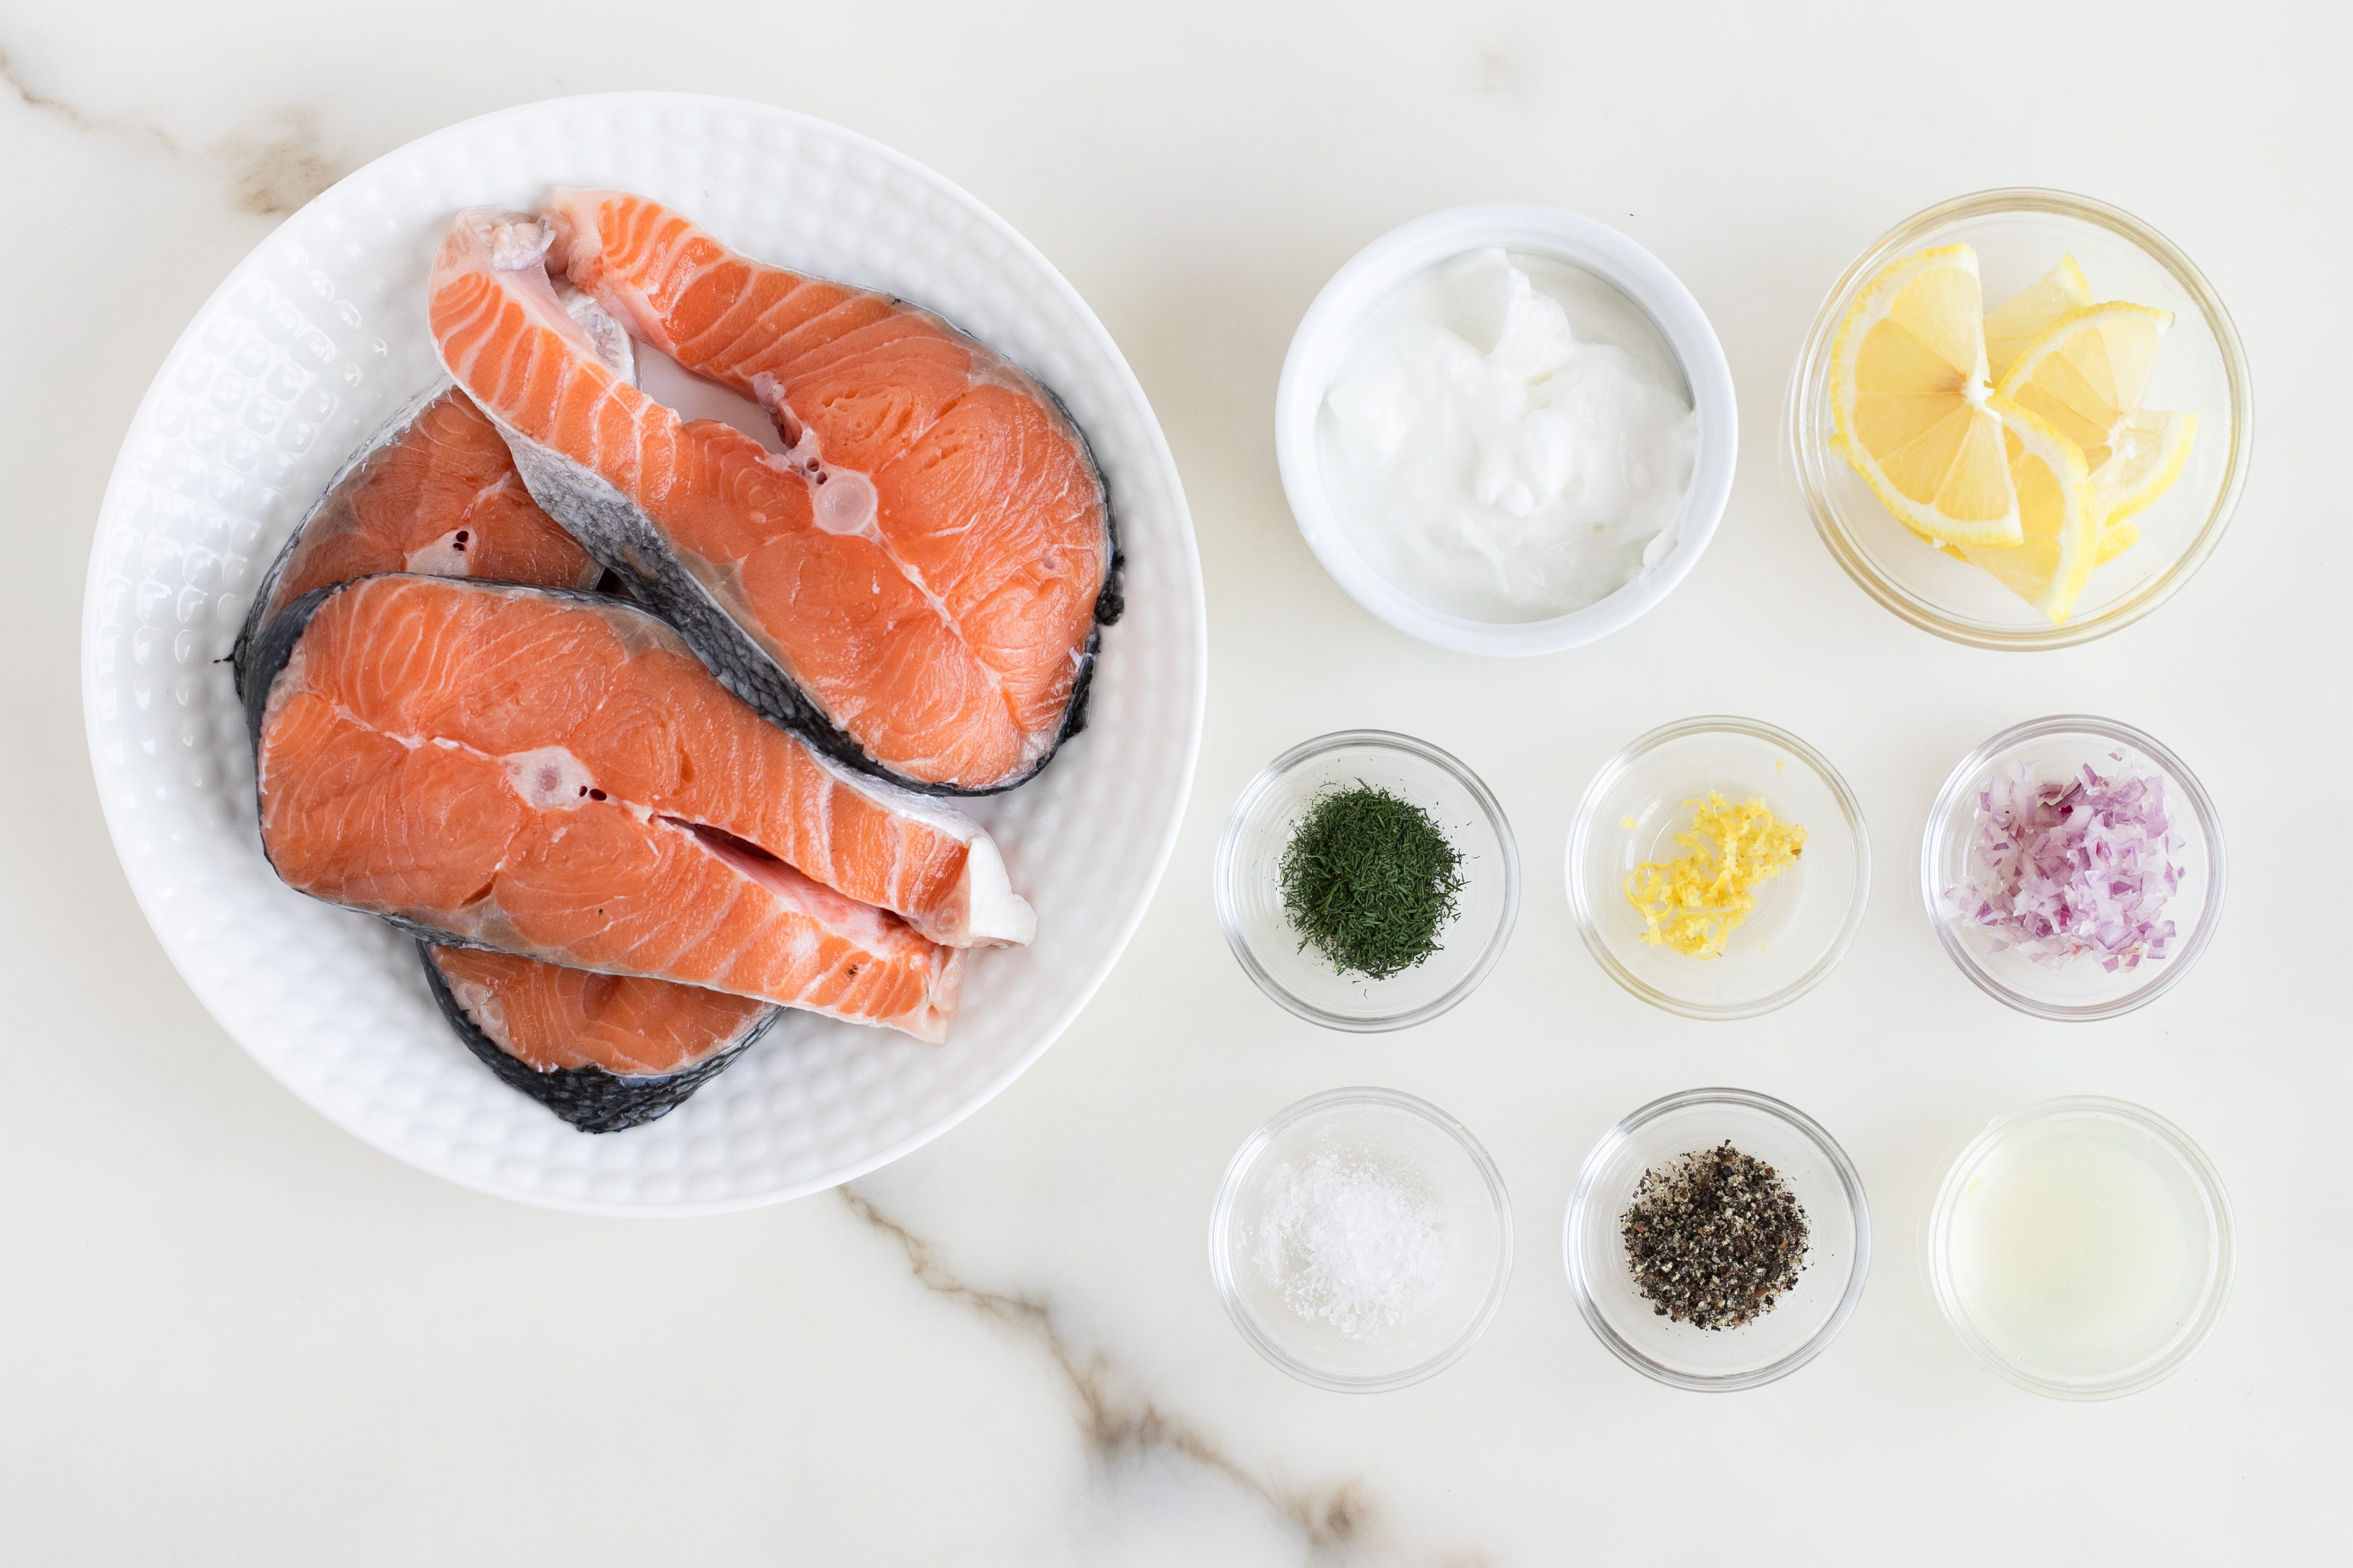 Ingredients for salmon steaks